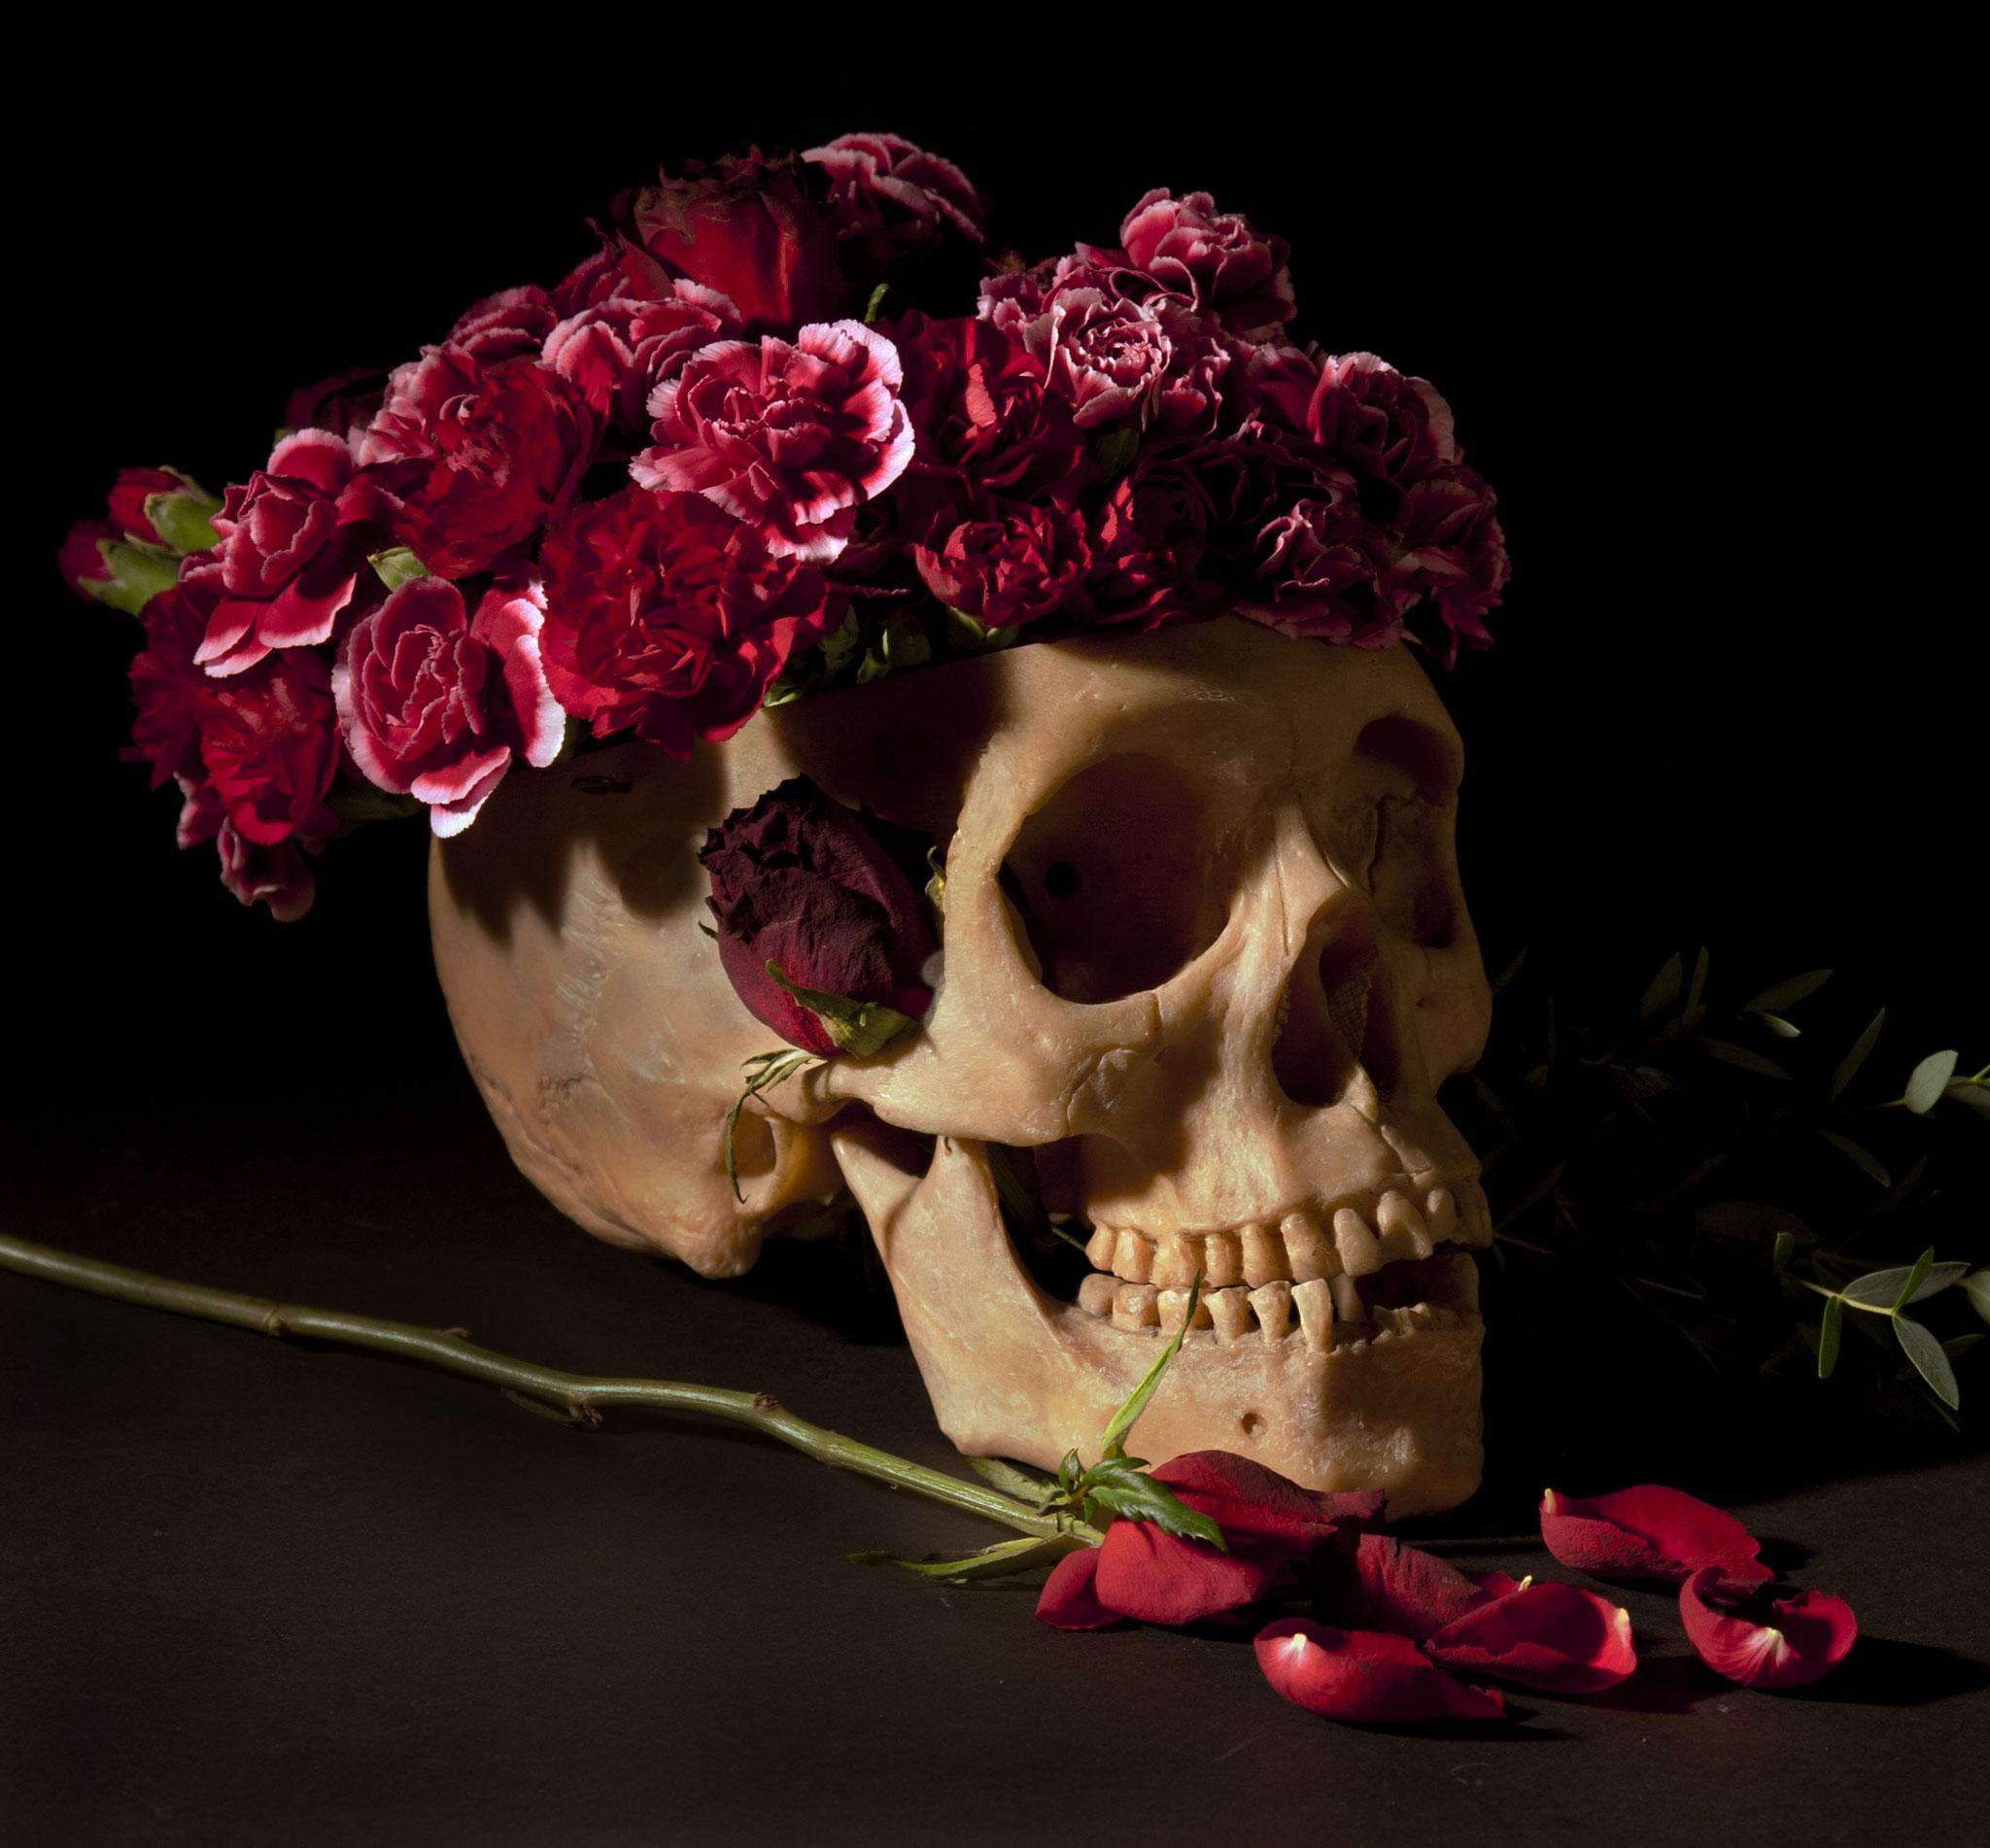 Vanitas Skull, colour still life of skull with flowers